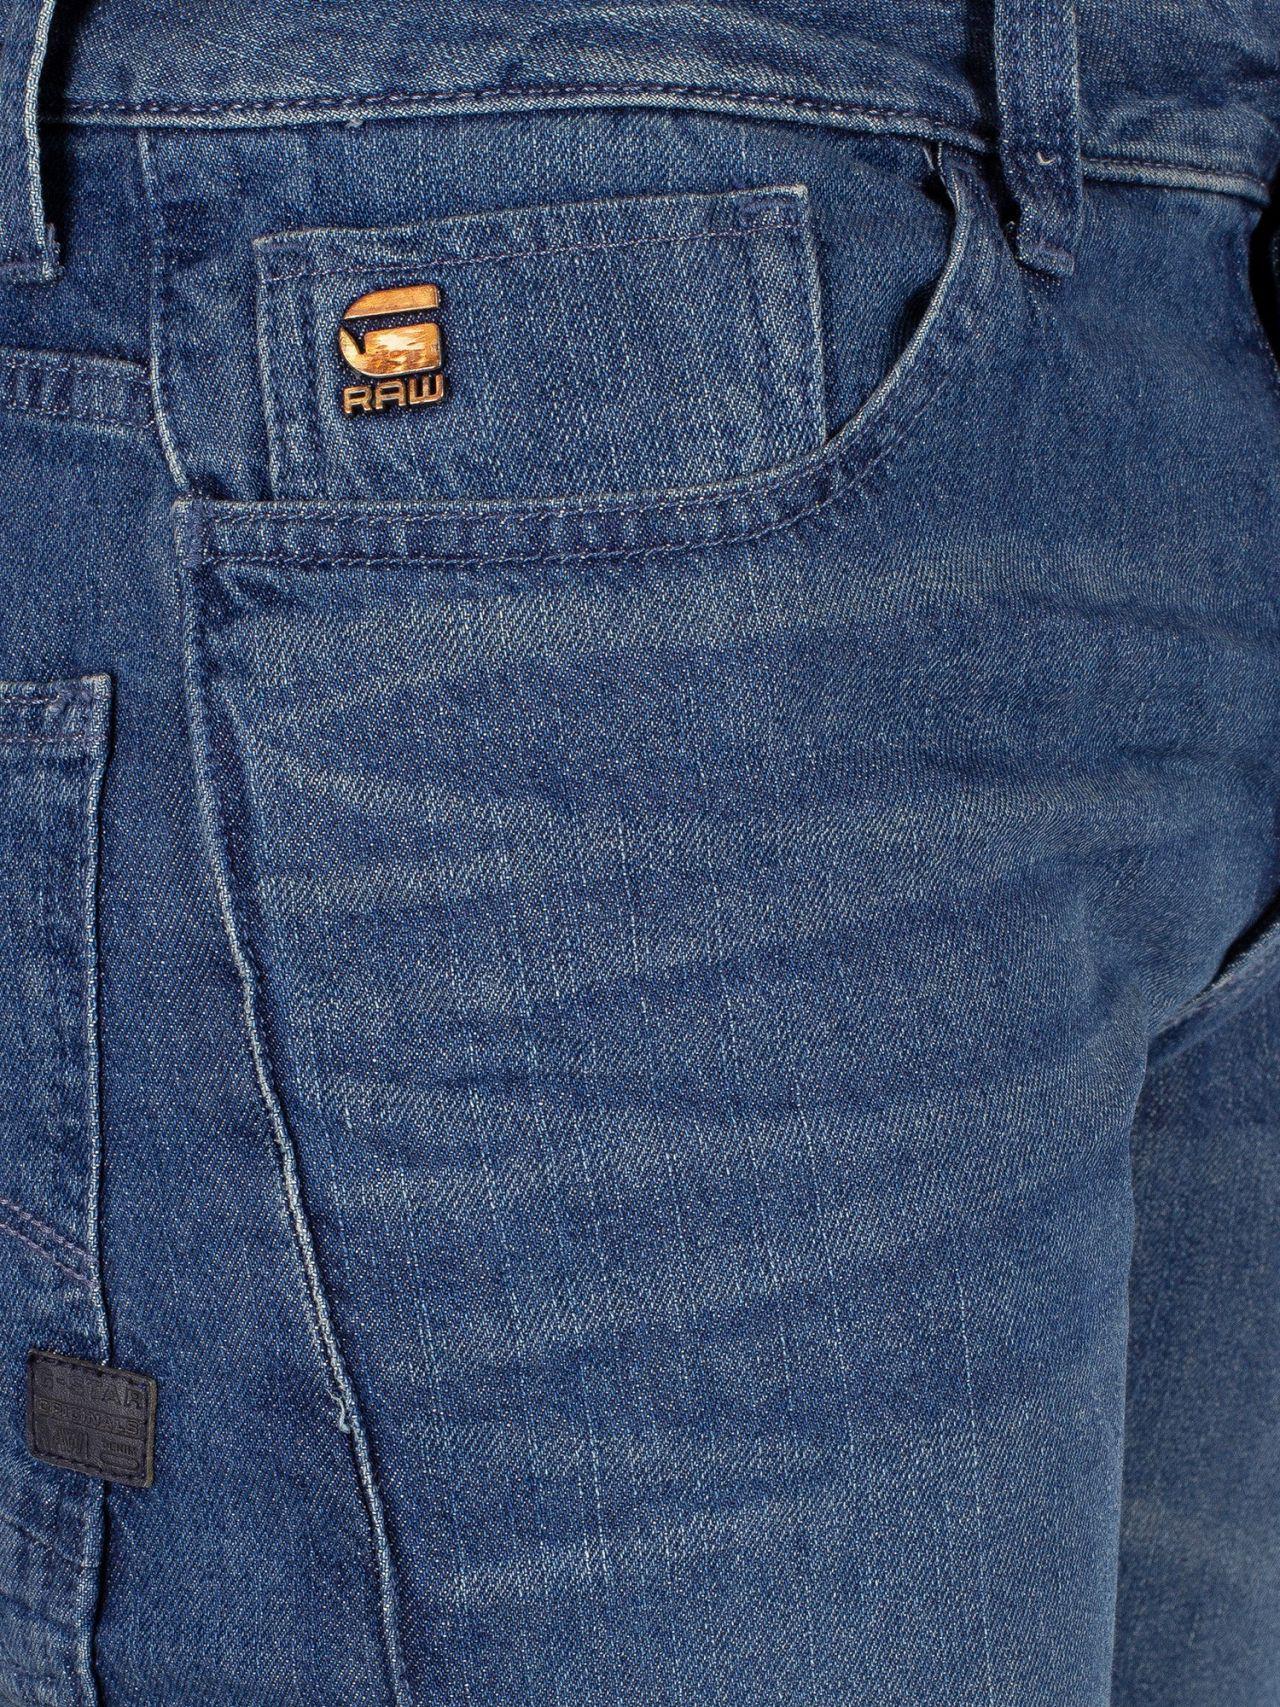 460b44e100c G-Star RAW Blue Motac Deconstructed 3d Slim Jeans in Blue for Men - Lyst